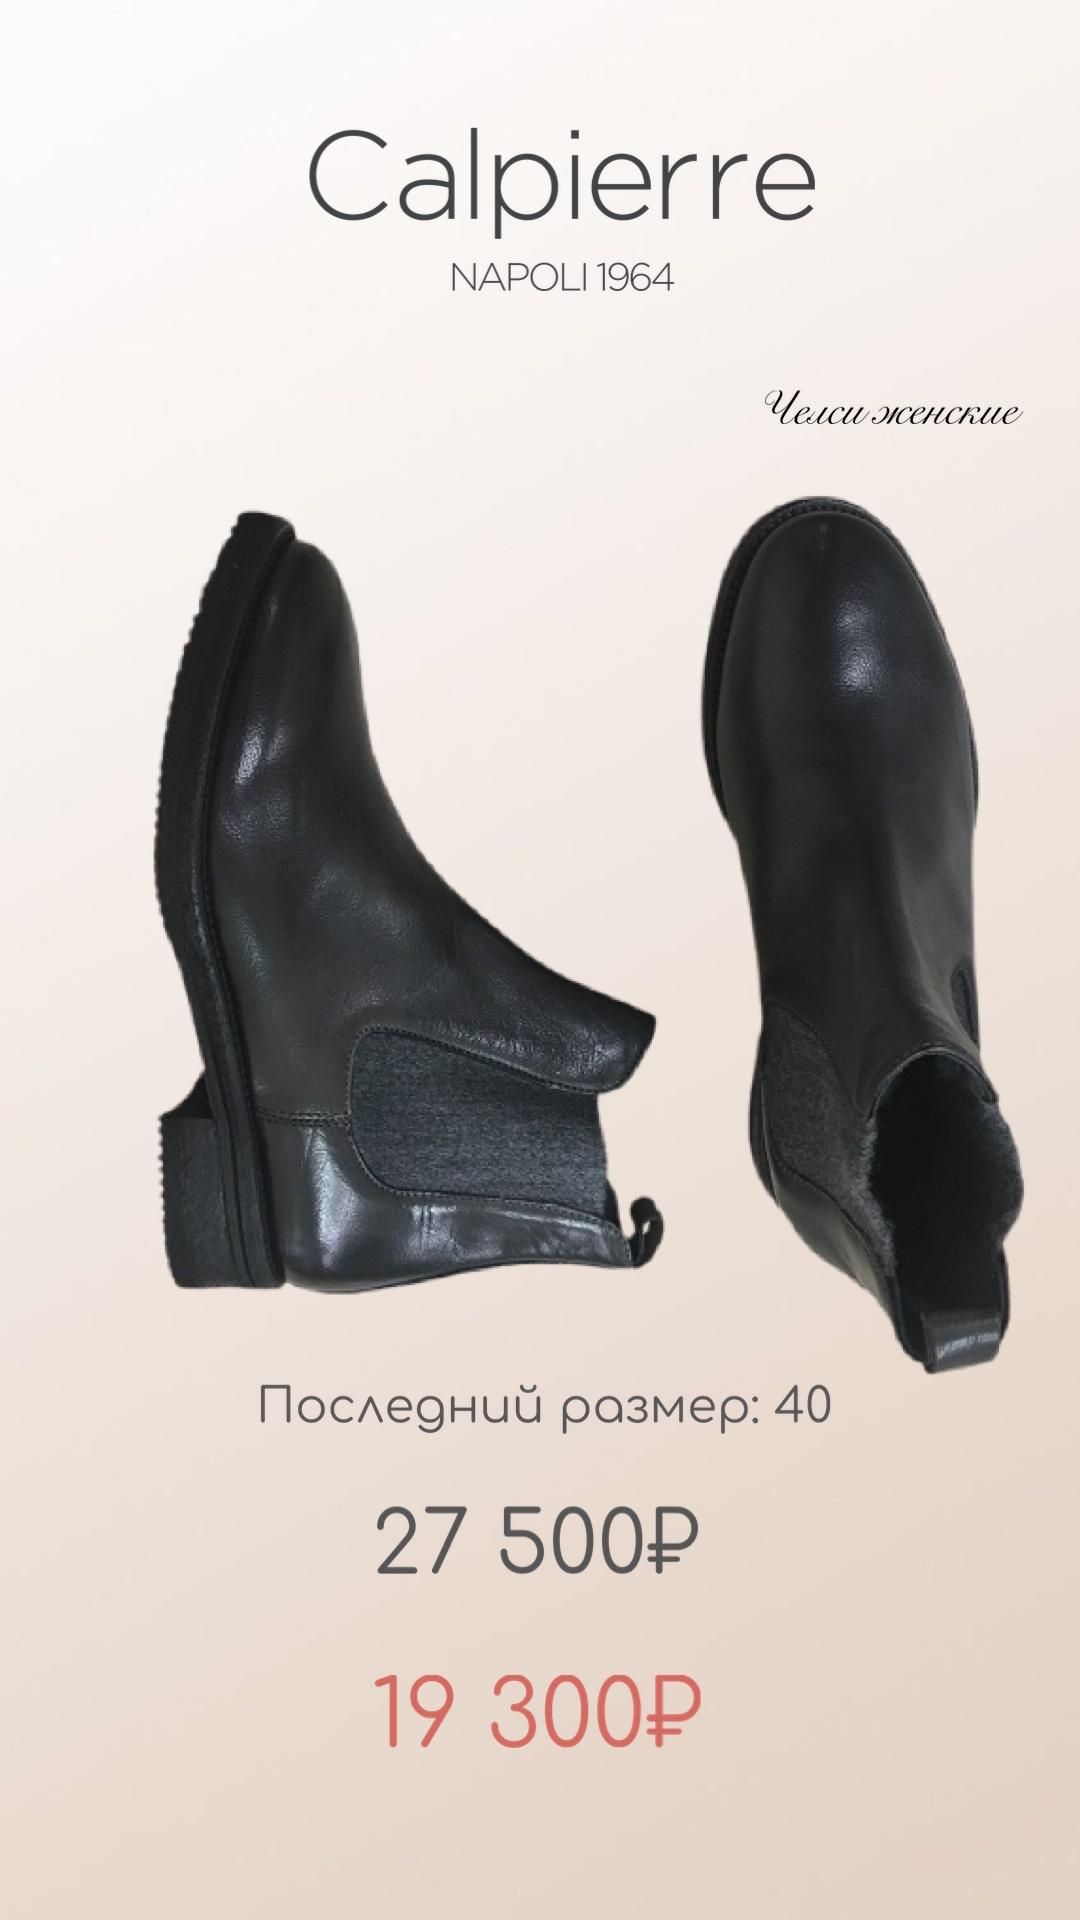 gallery_1_pust-ves-mir-budet-u-vashih-nog-2